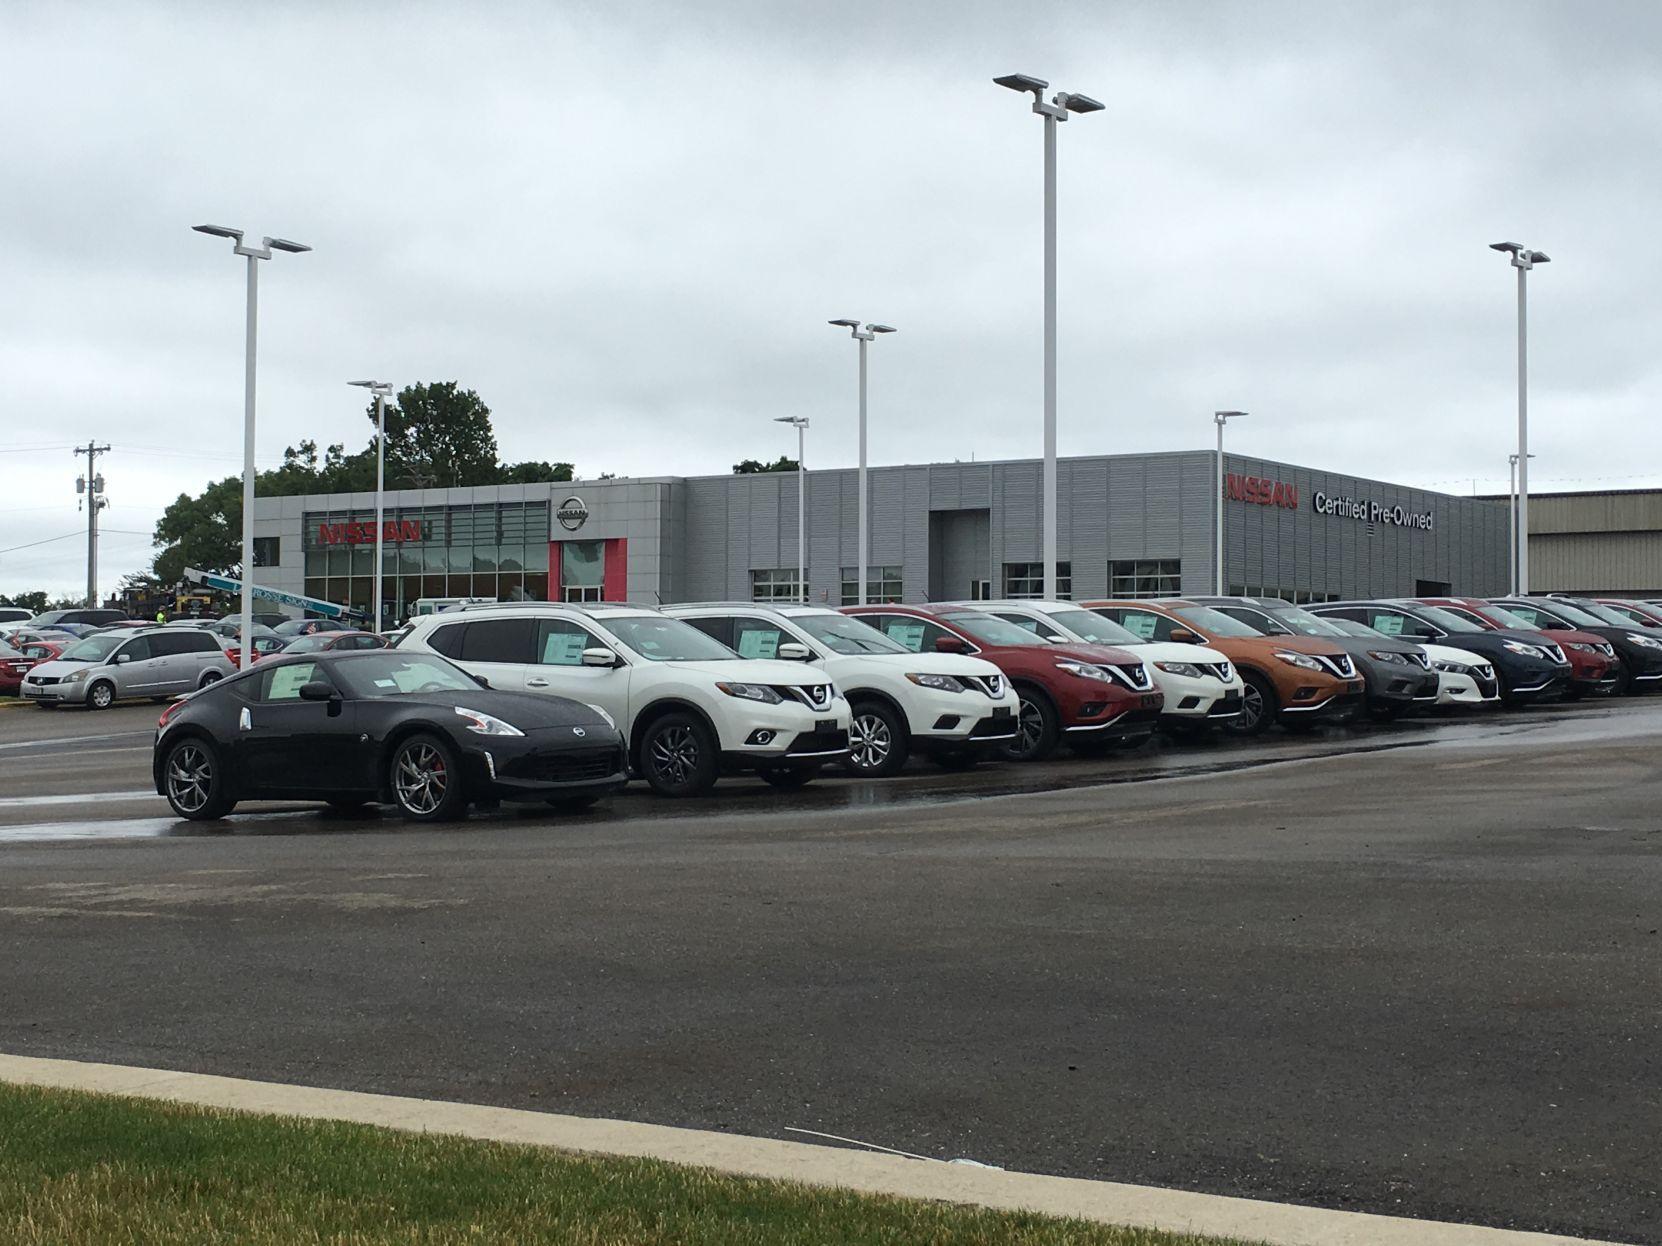 Marvelous Kayser Automotive Sells Nissan Brand To Rosen Of Milwaukee | Madison  Wisconsin Business News | Madison.com